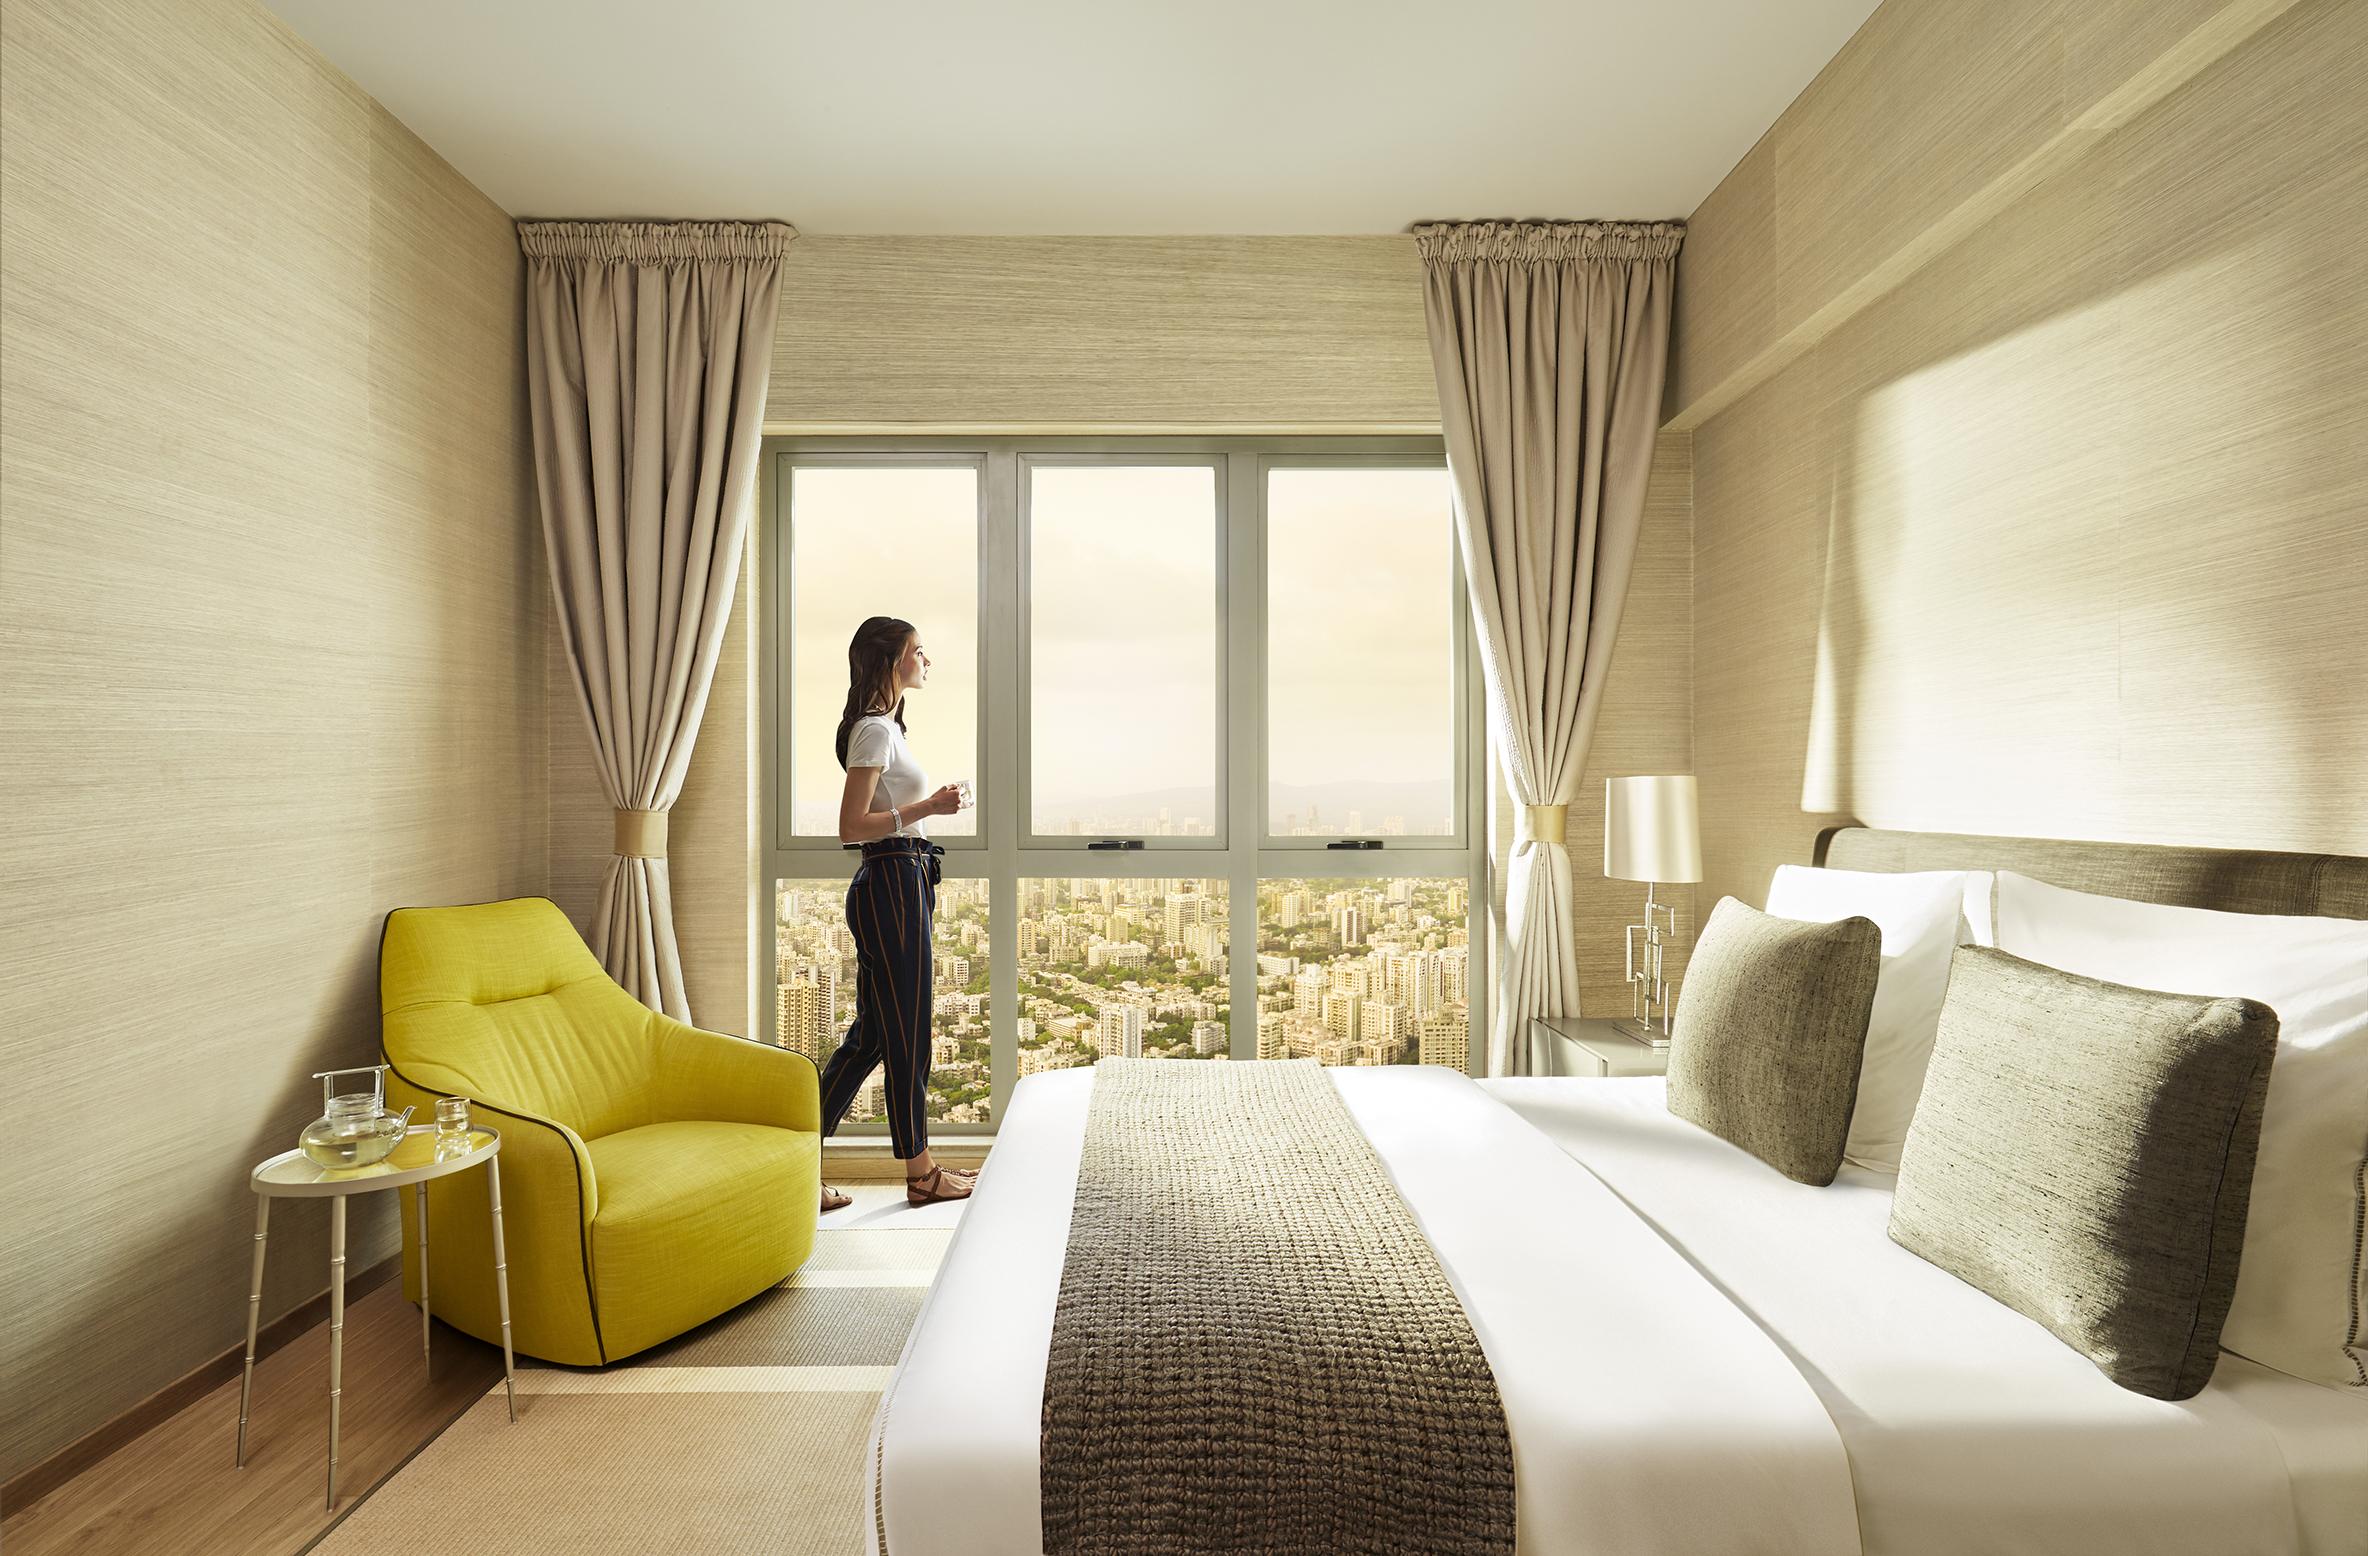 SAS_Bedroom1_1212Main.jpg